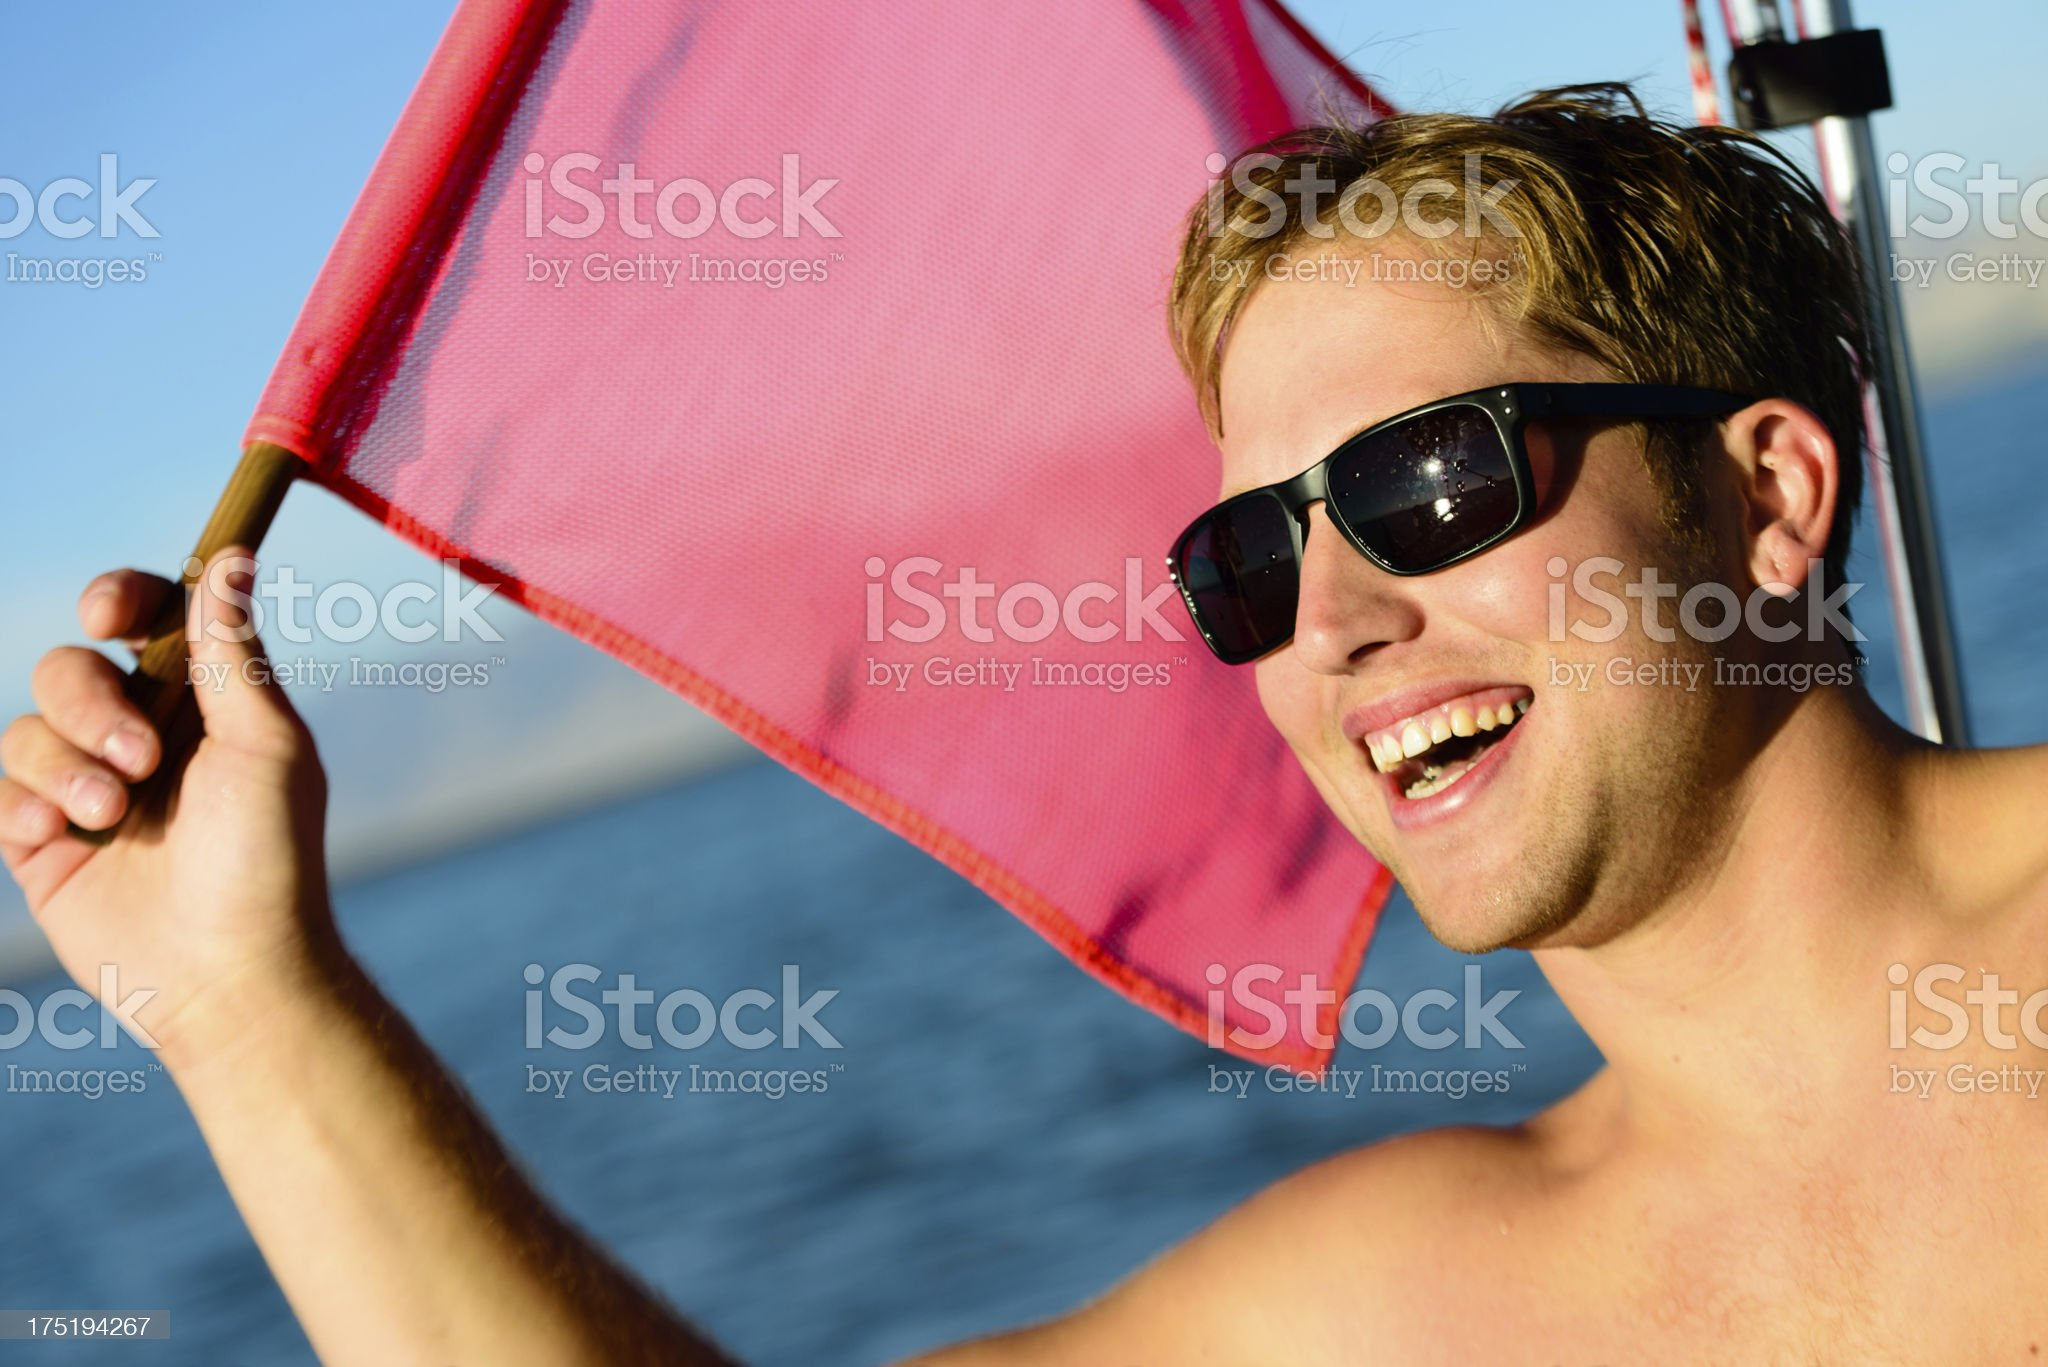 Raise the Safety Flag royalty-free stock photo